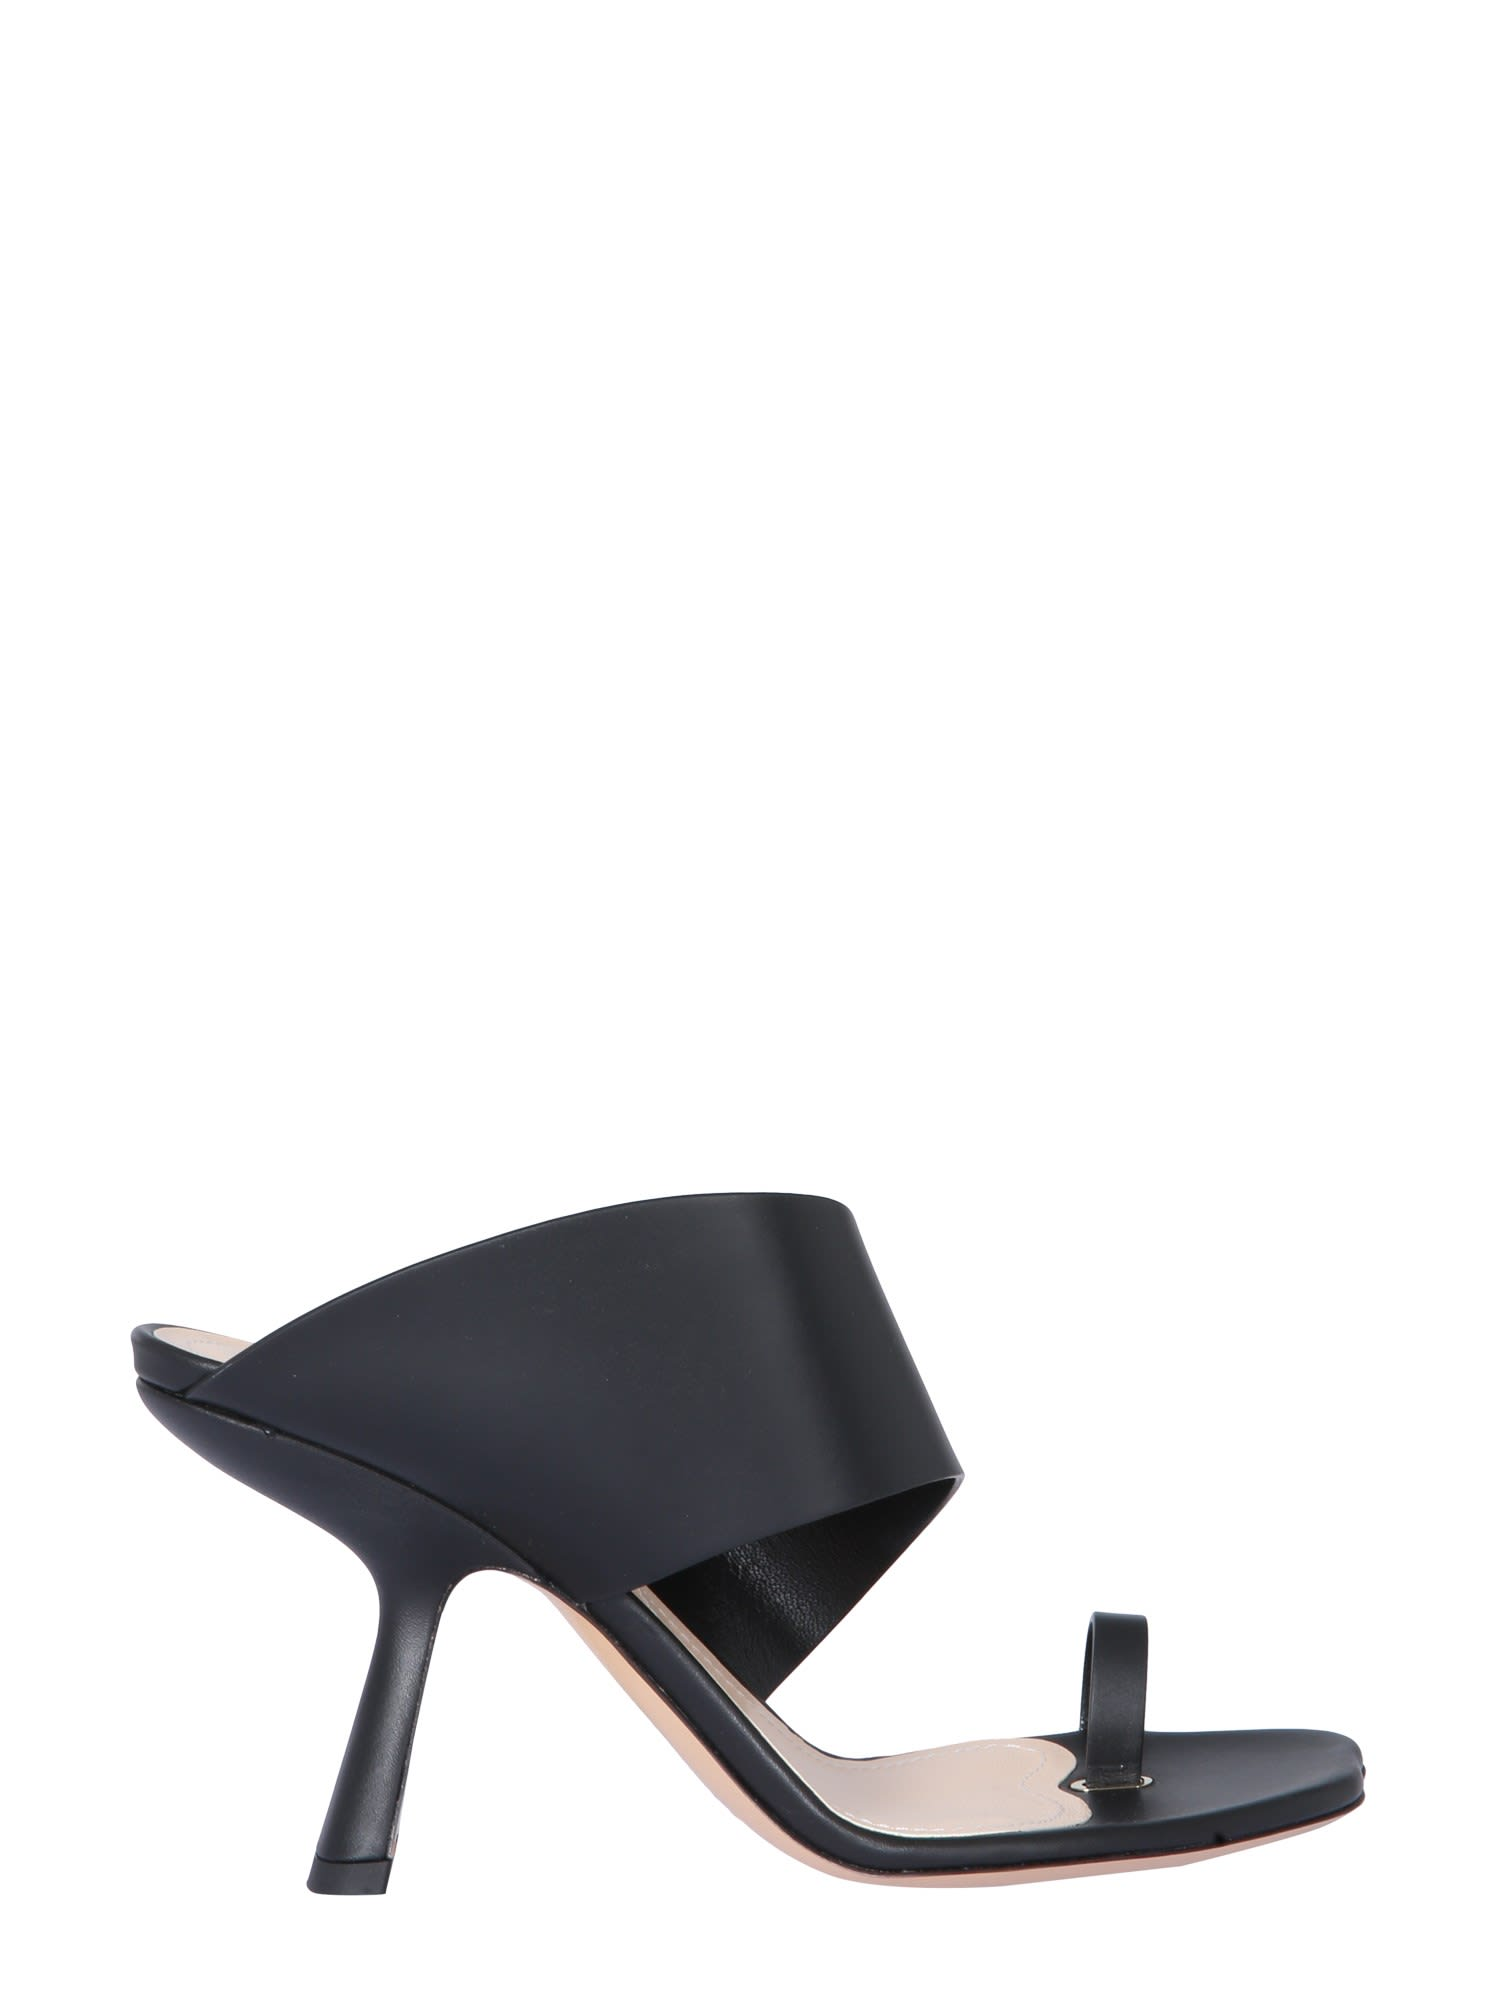 Buy Nicholas Kirkwood Brasilia Sandals online, shop Nicholas Kirkwood shoes with free shipping